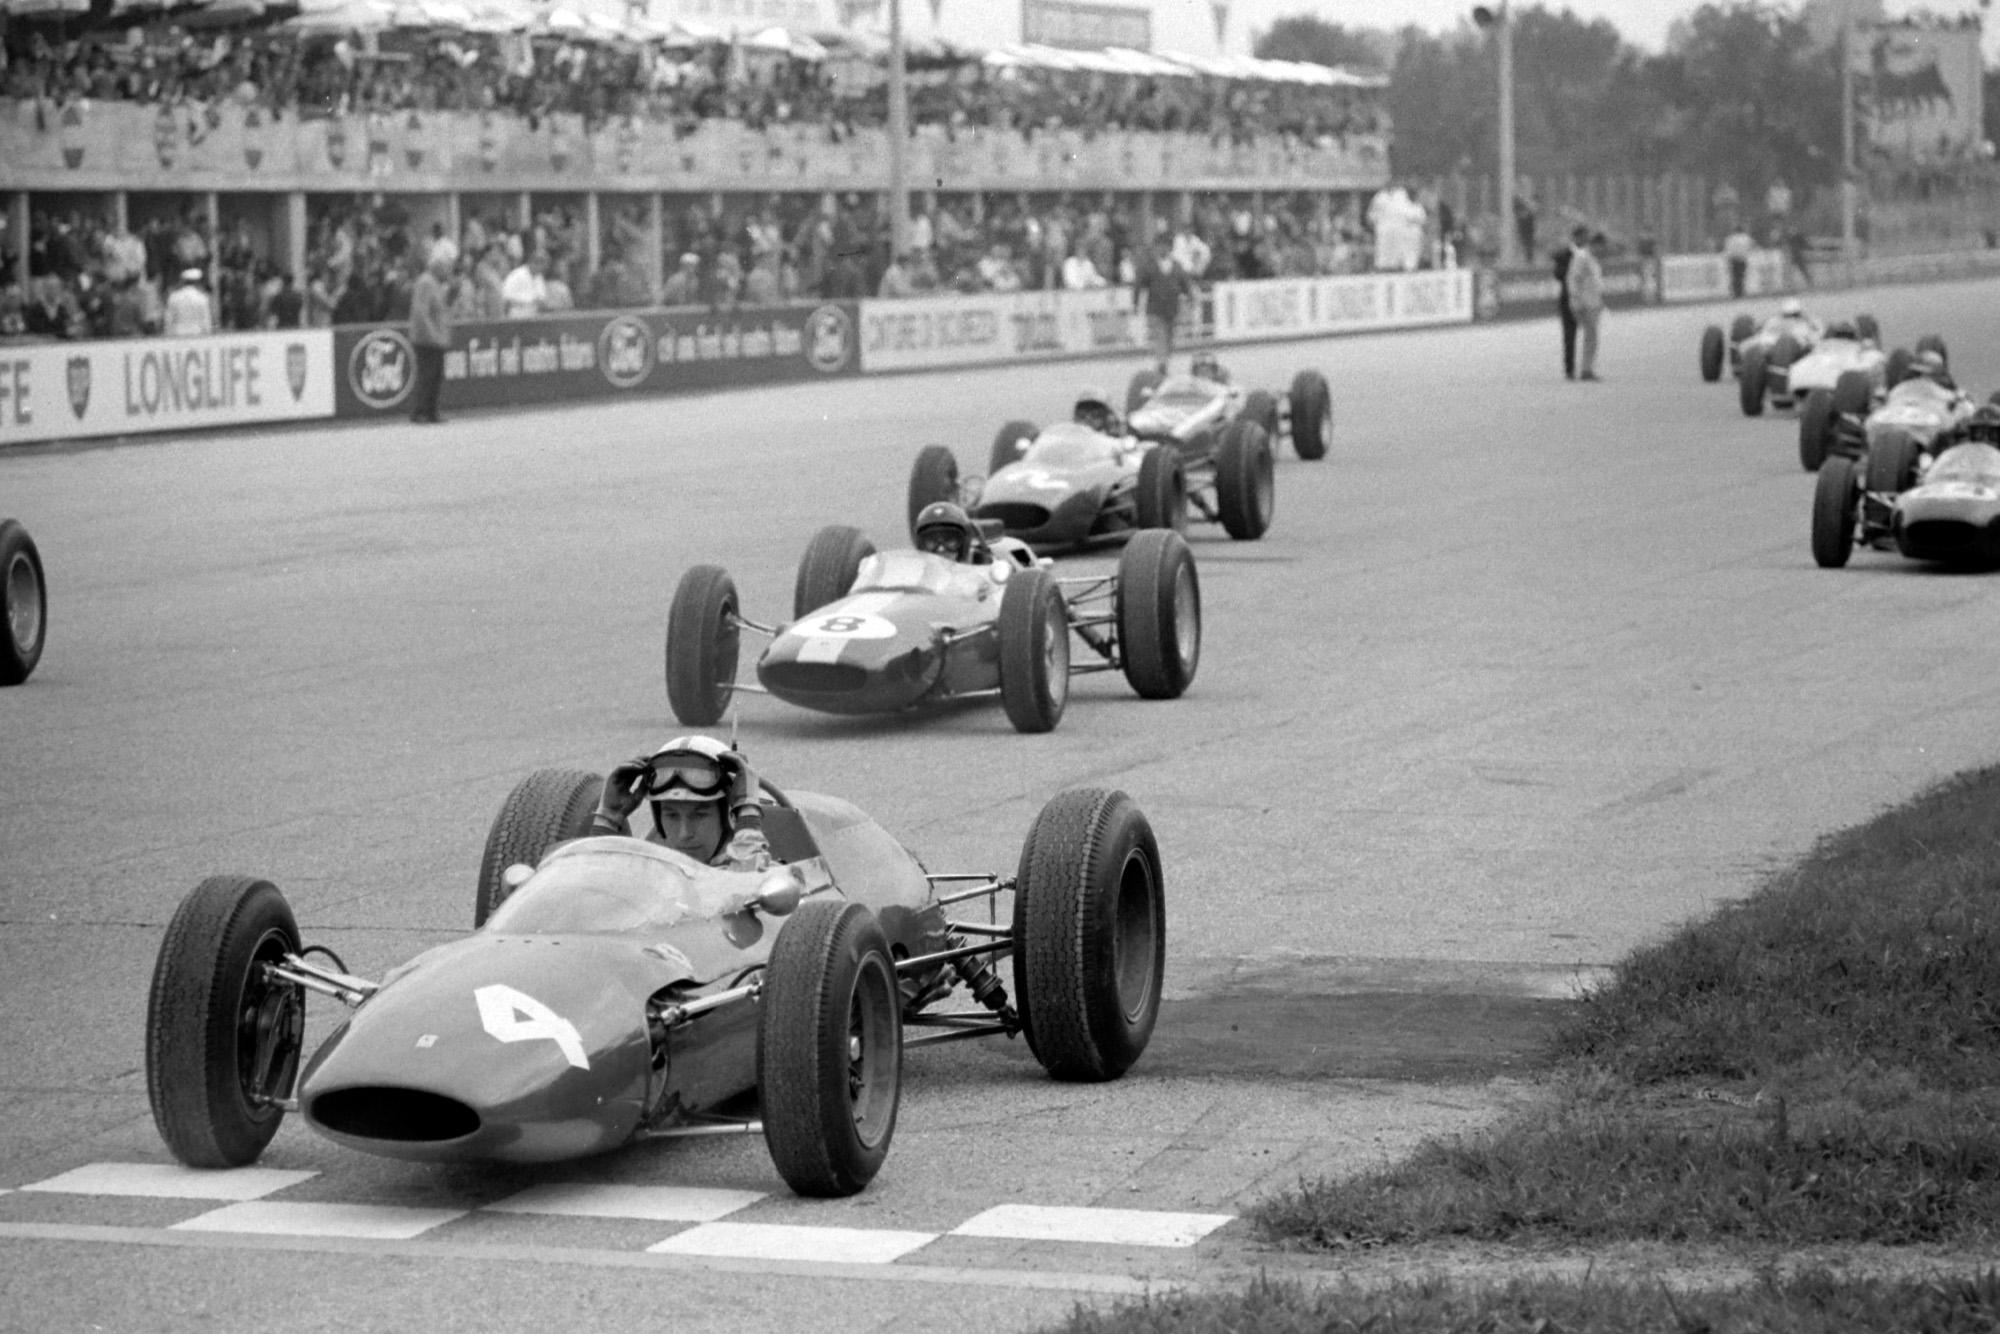 John Surtees, Ferrari 156 Aero, Jim Clark, Lotus 25 Climax, Lorenzo Bandini, Ferrari 156/63, Dan Gurney, Brabham BT7 Climax, and the rest of the field on the grid awaiting the start.